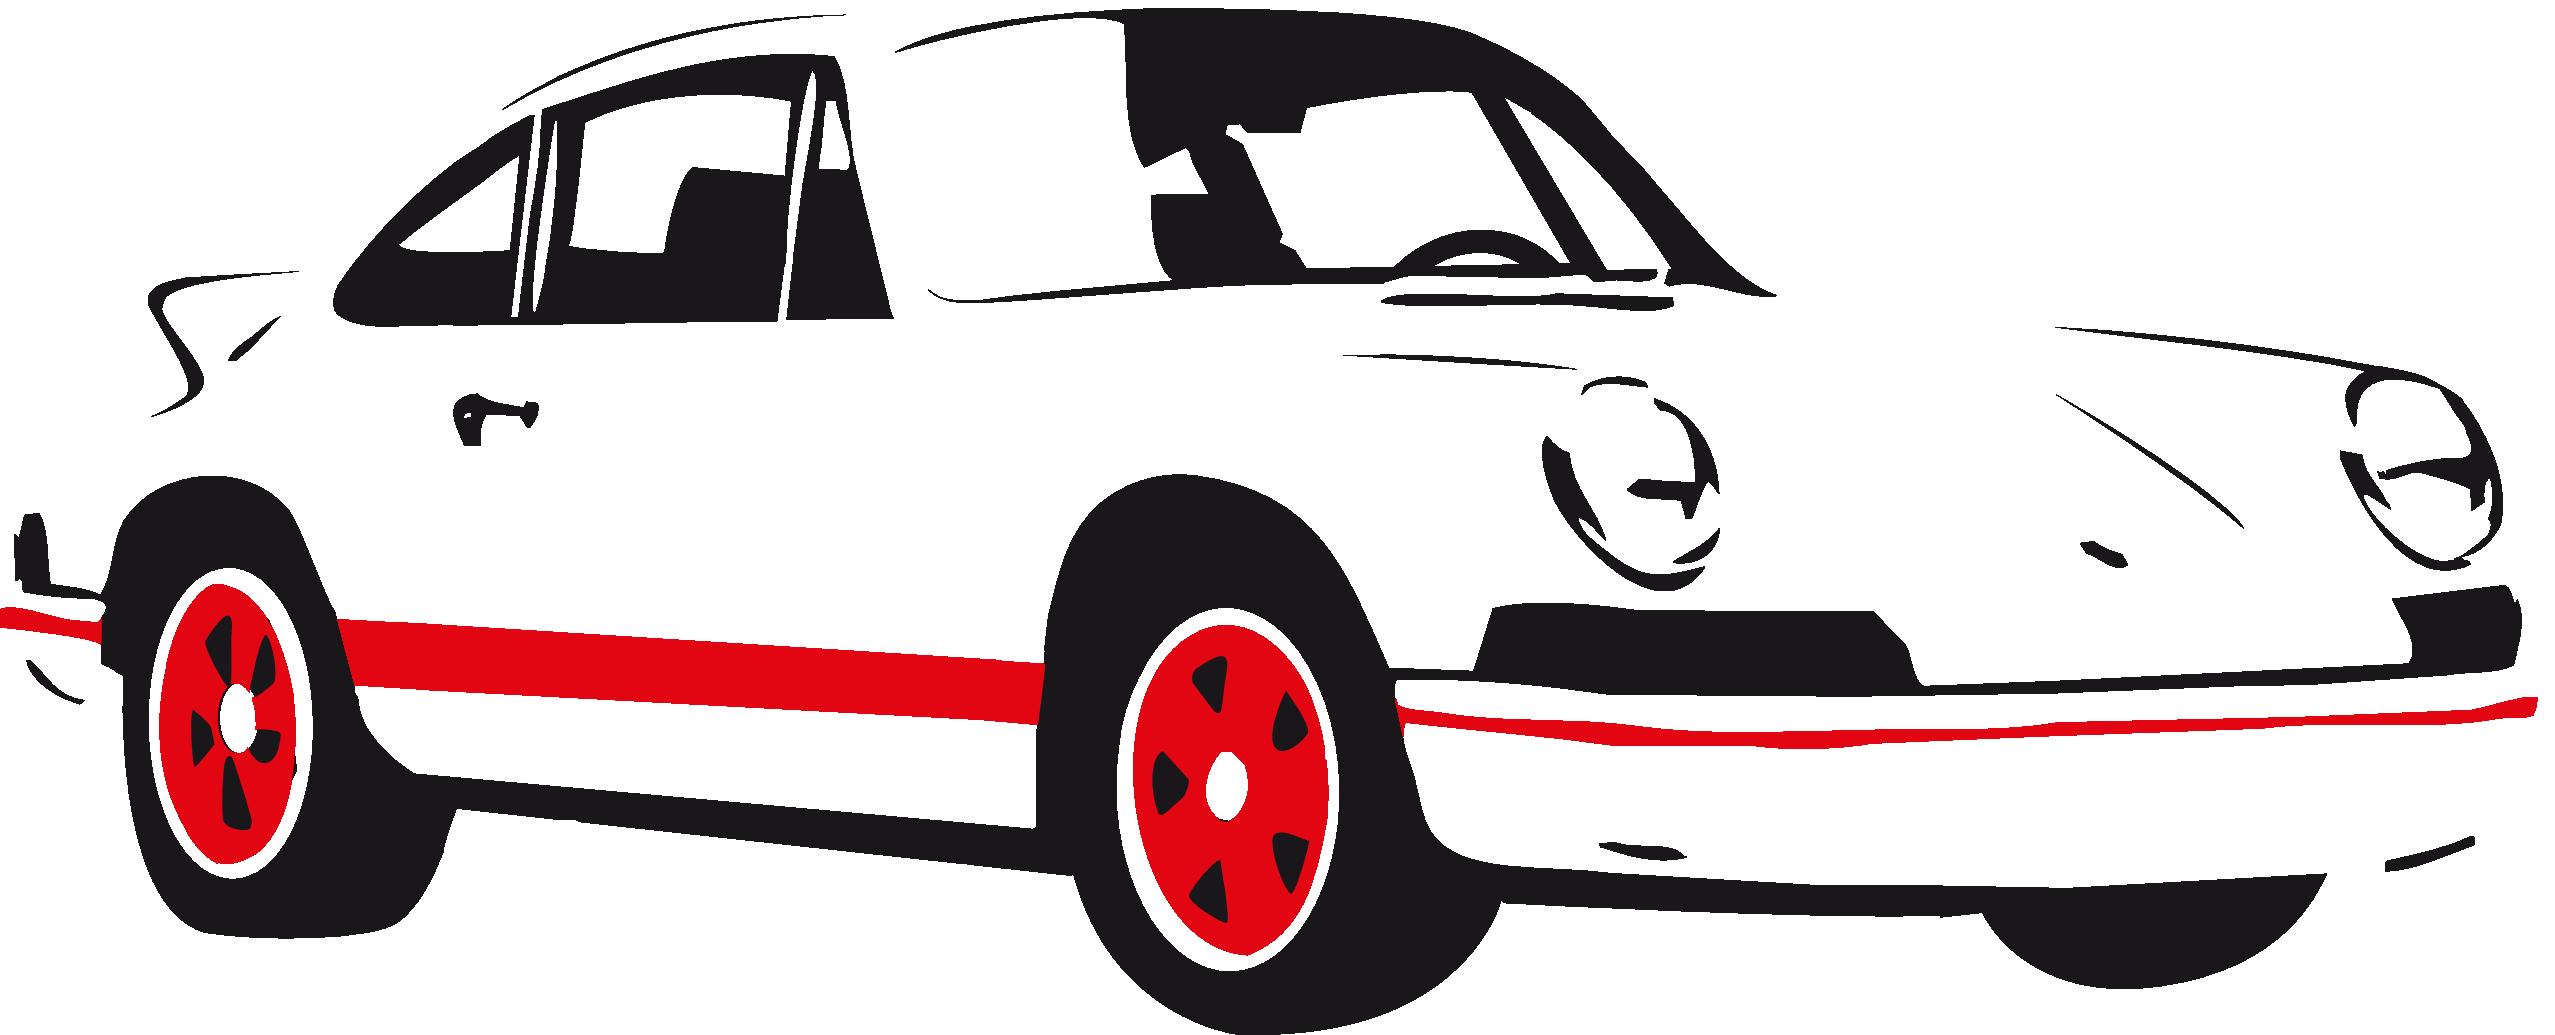 banner transparent 911 clipart. Porsche silhouette at getdrawings